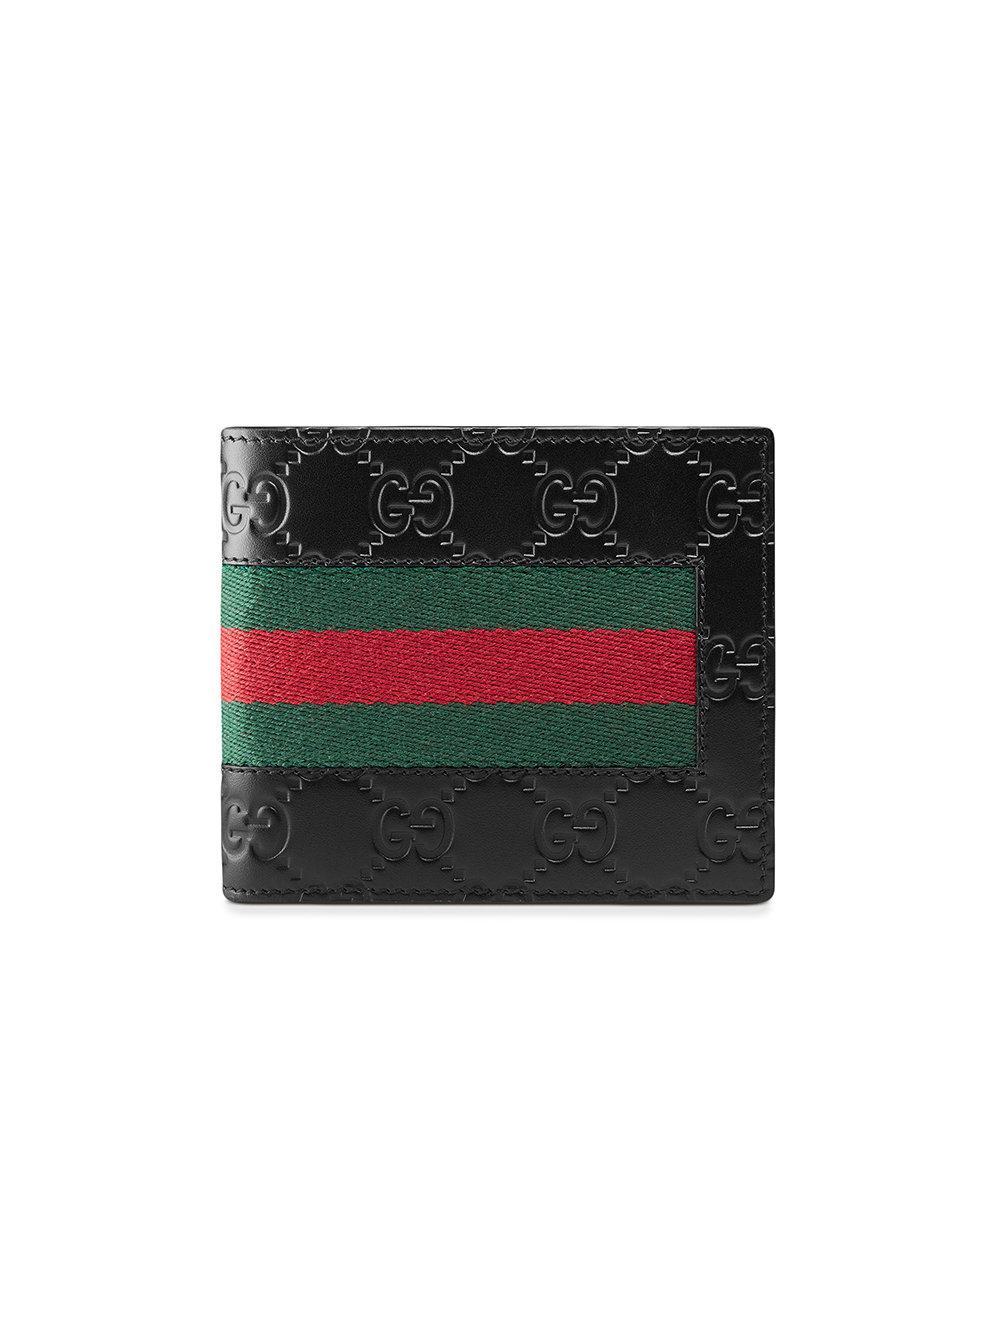 Gucci Signature Web Wallet in Black for Men